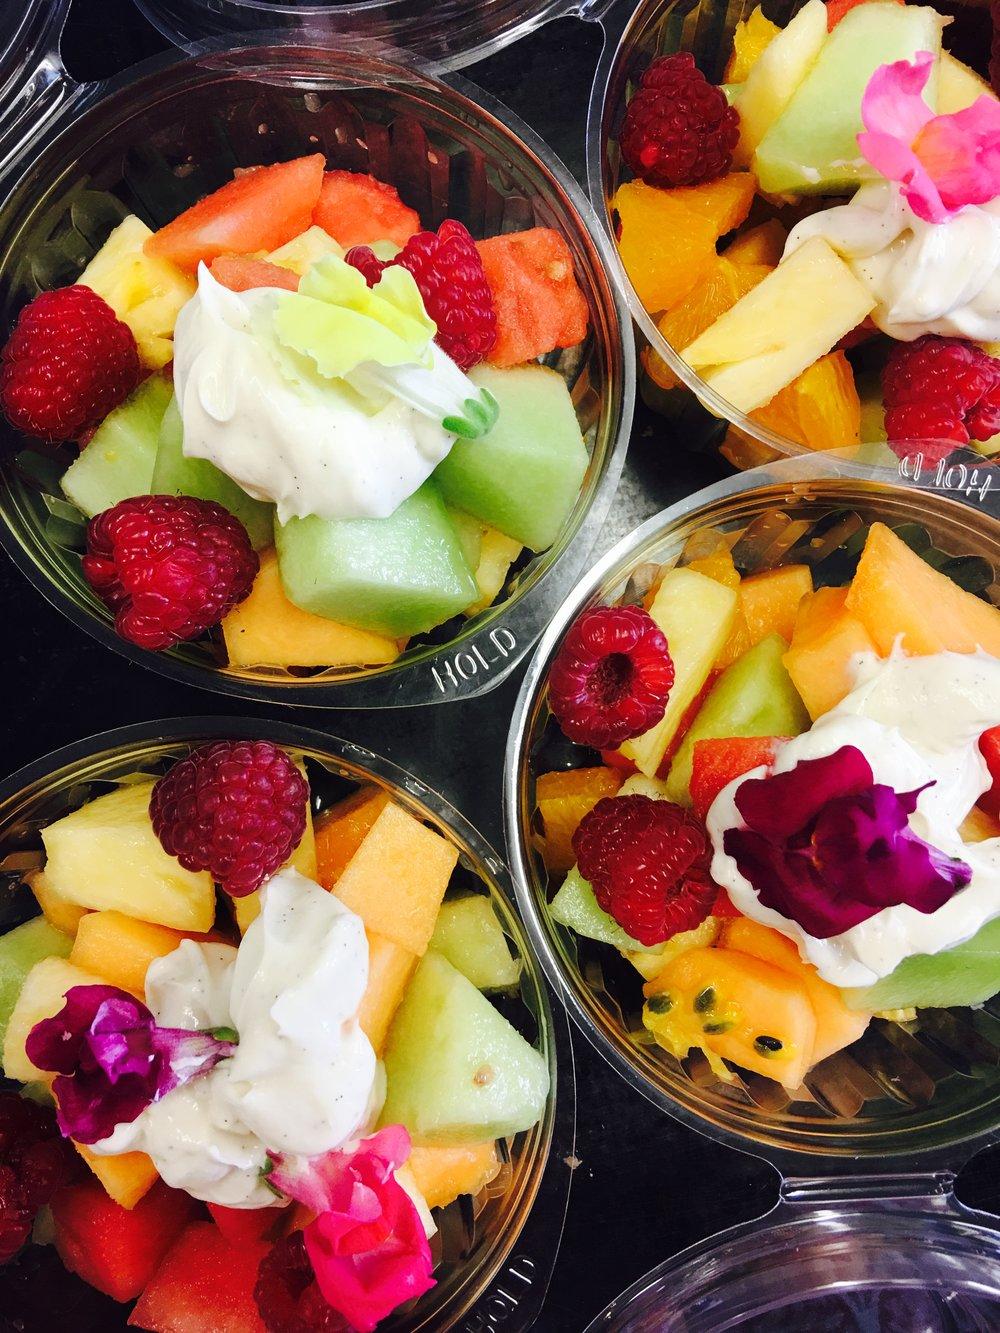 Fruit salad with flowers.jpg